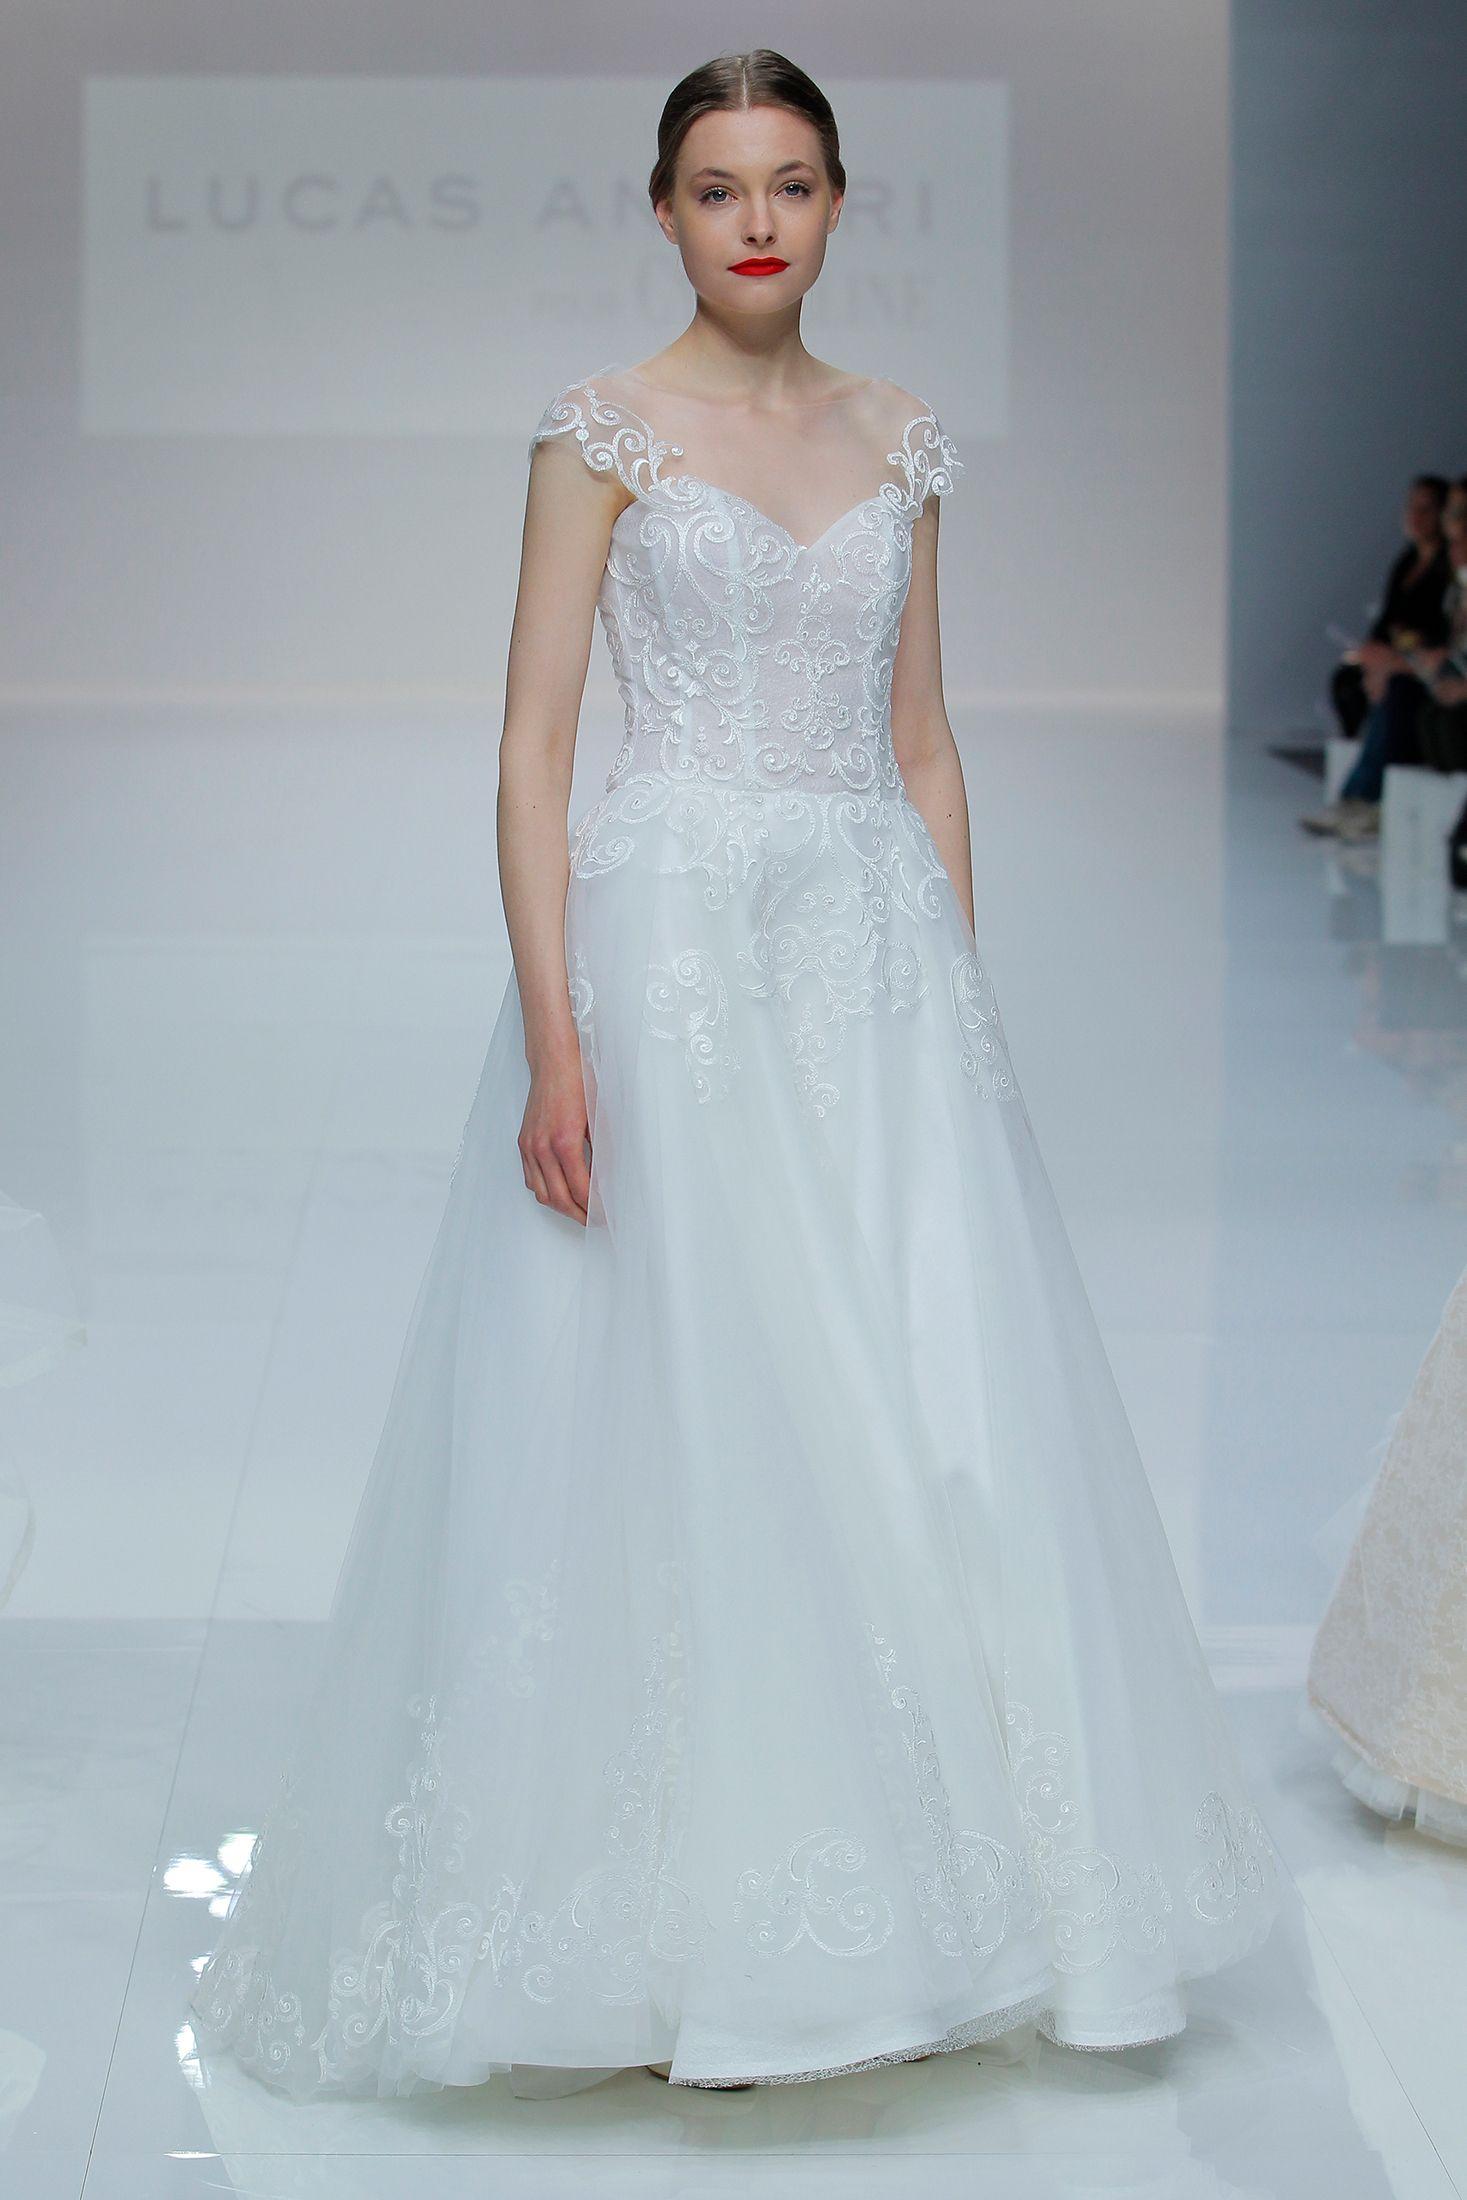 Vestido de Novia de Cymbeline - CY 078 #wedding #bodas #boda ...